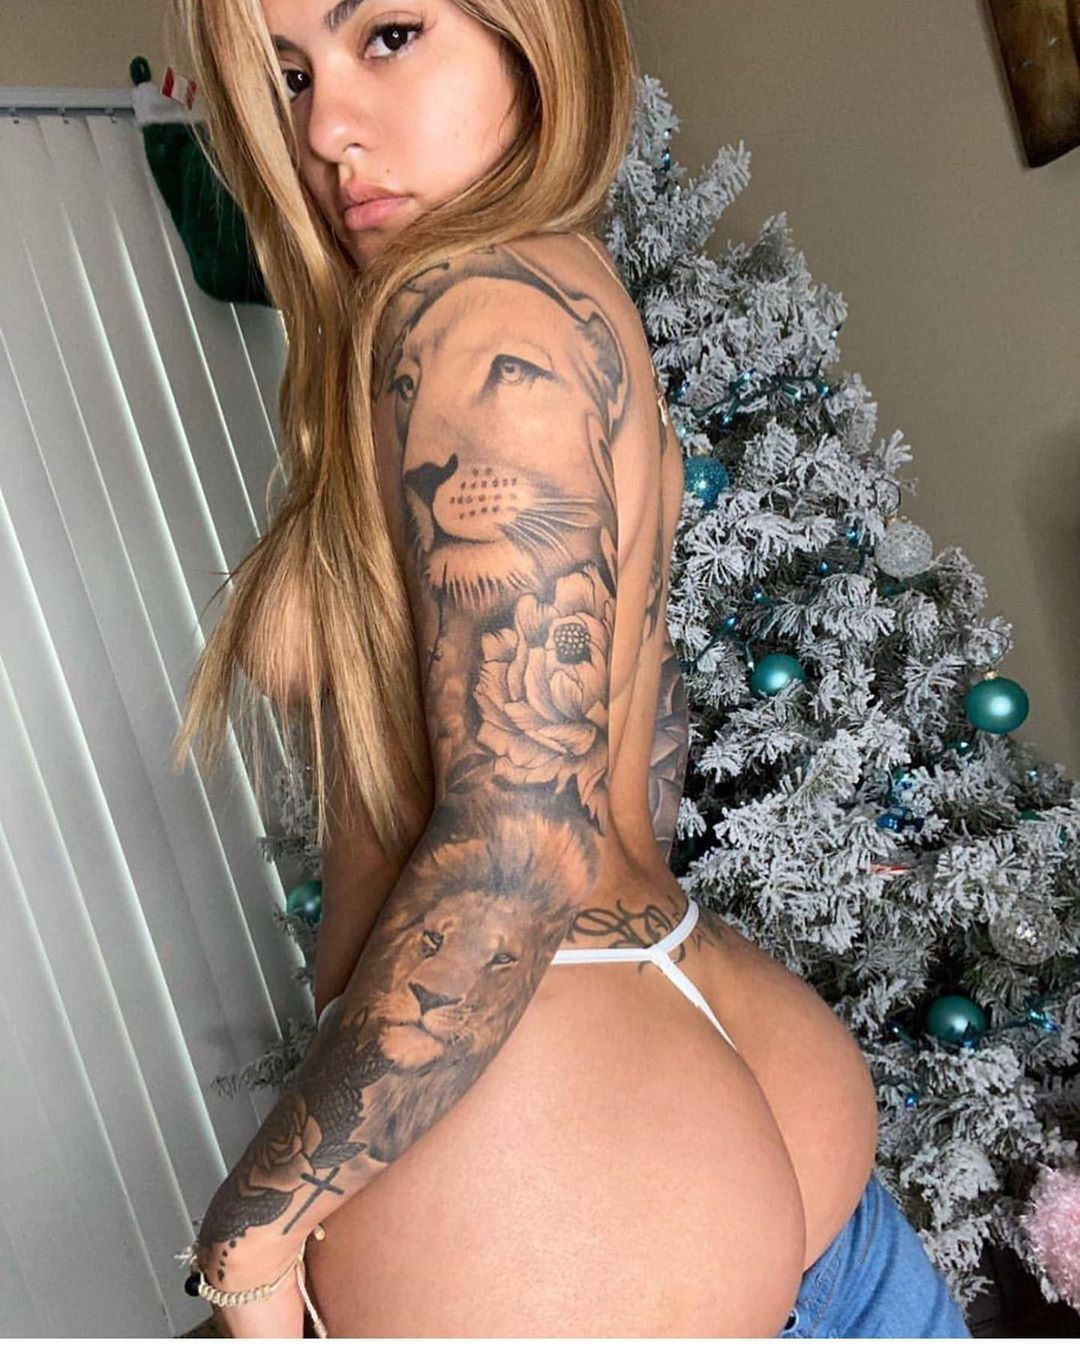 Misstiffy08 Nude Onlyfans Tiff08 Leaked 0004